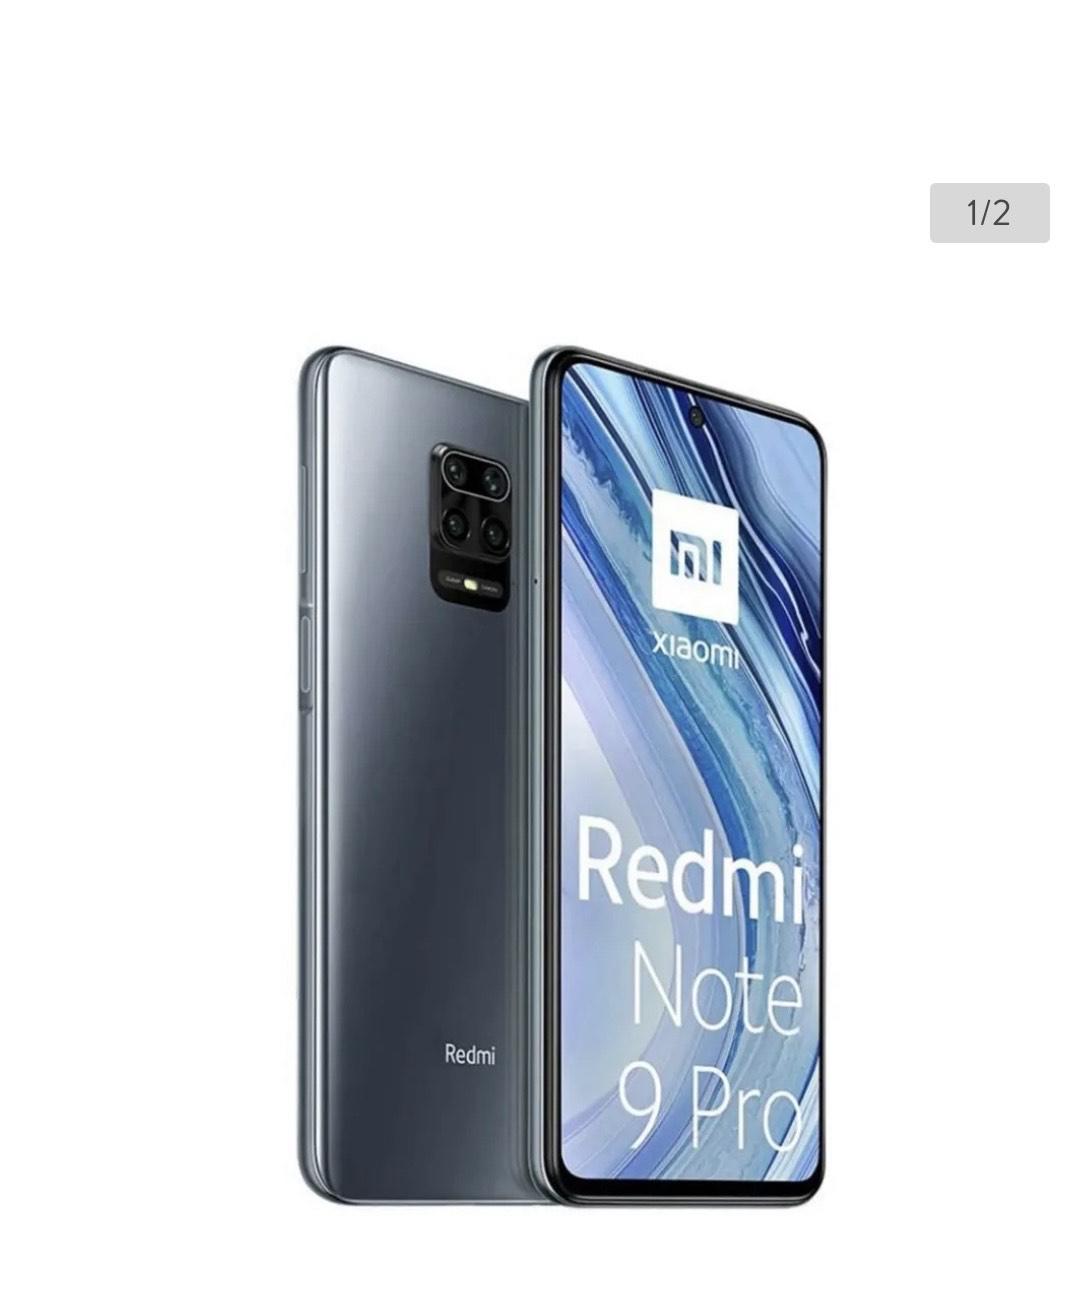 Walmart: Celular Xiaomi Redmi Note 9 Pro 64Gb, 6 Gb Ram